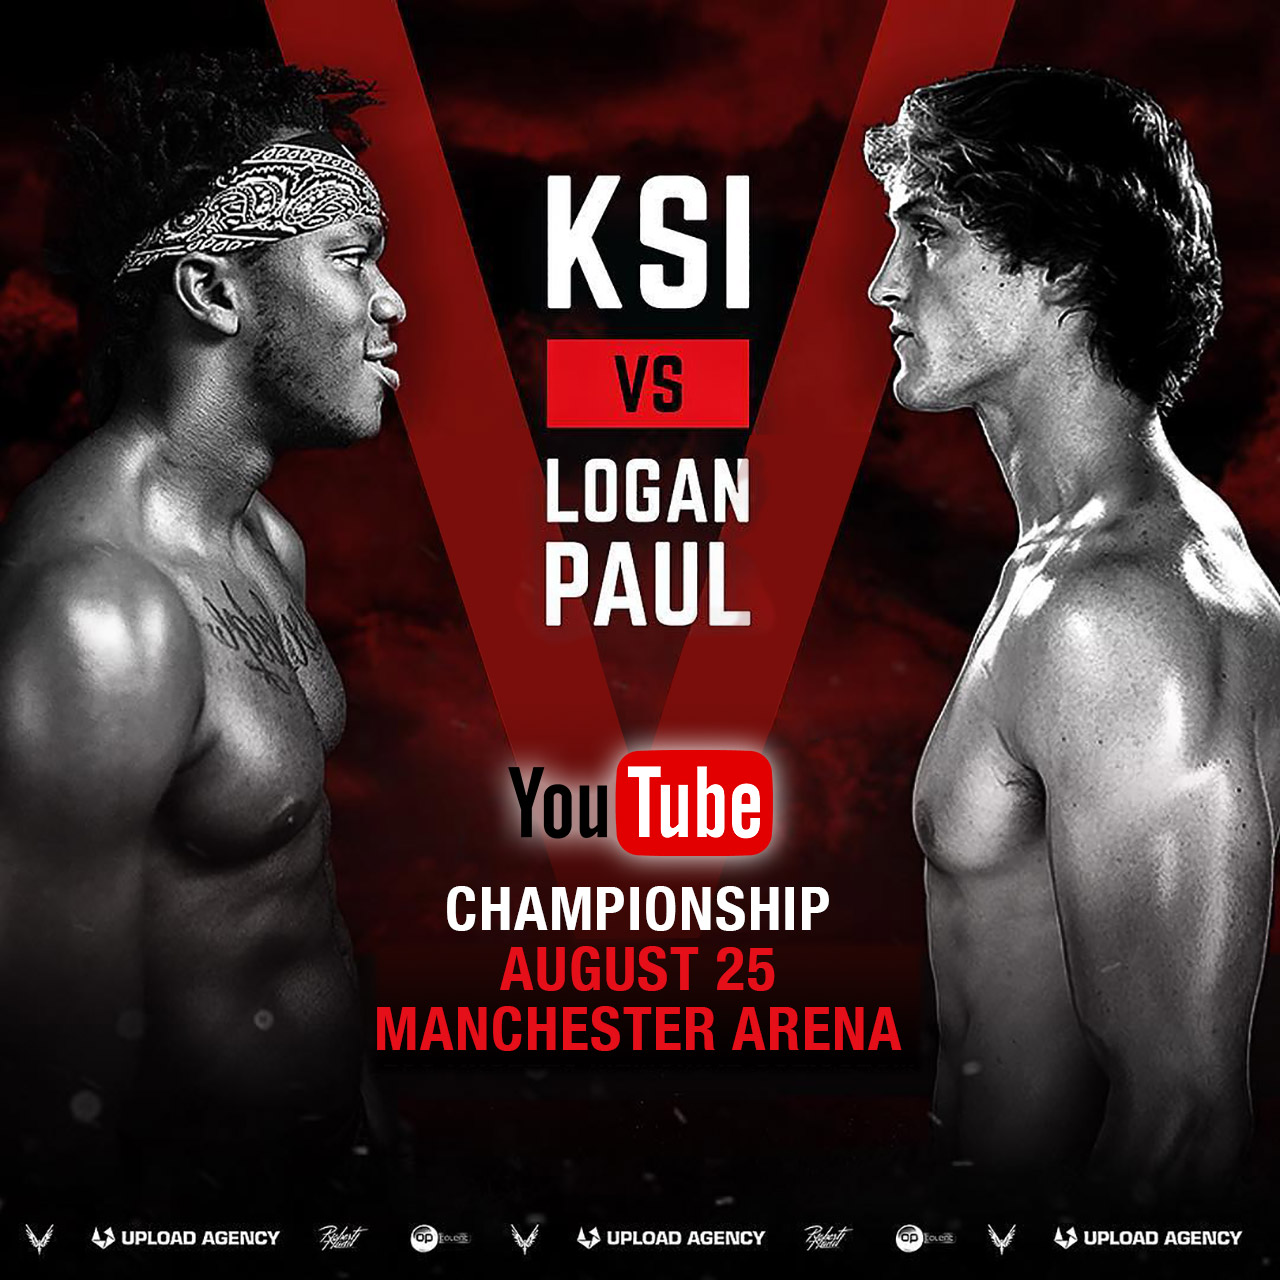 ksi vs logan paul - photo #2